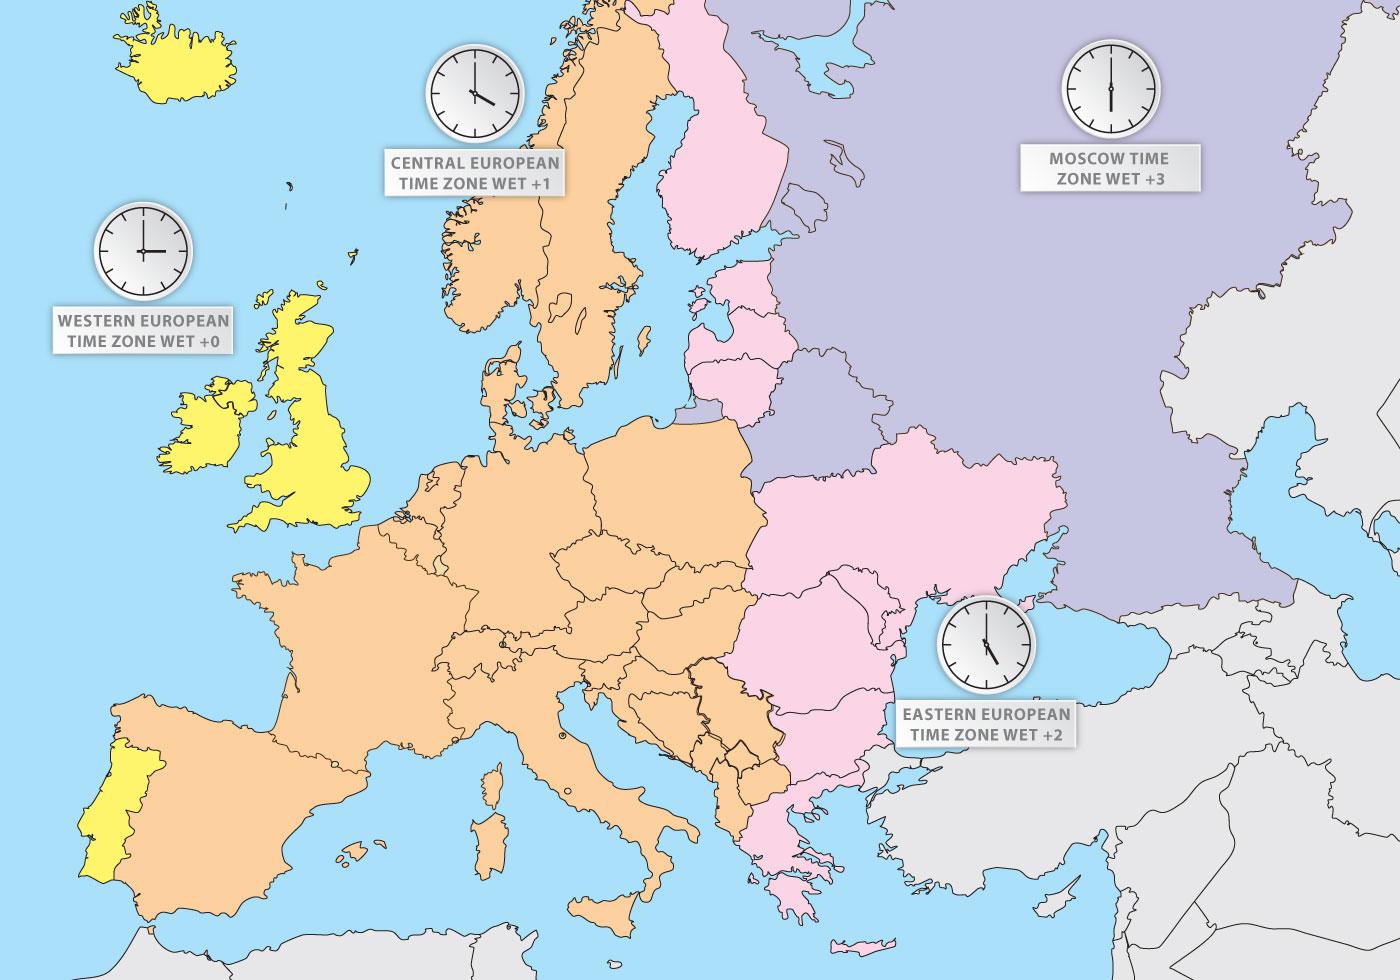 Karta Europa Tidszoner.Tidssoner I Europa Europe Map Vector Ladda Ner Gratis Vektorgrafik